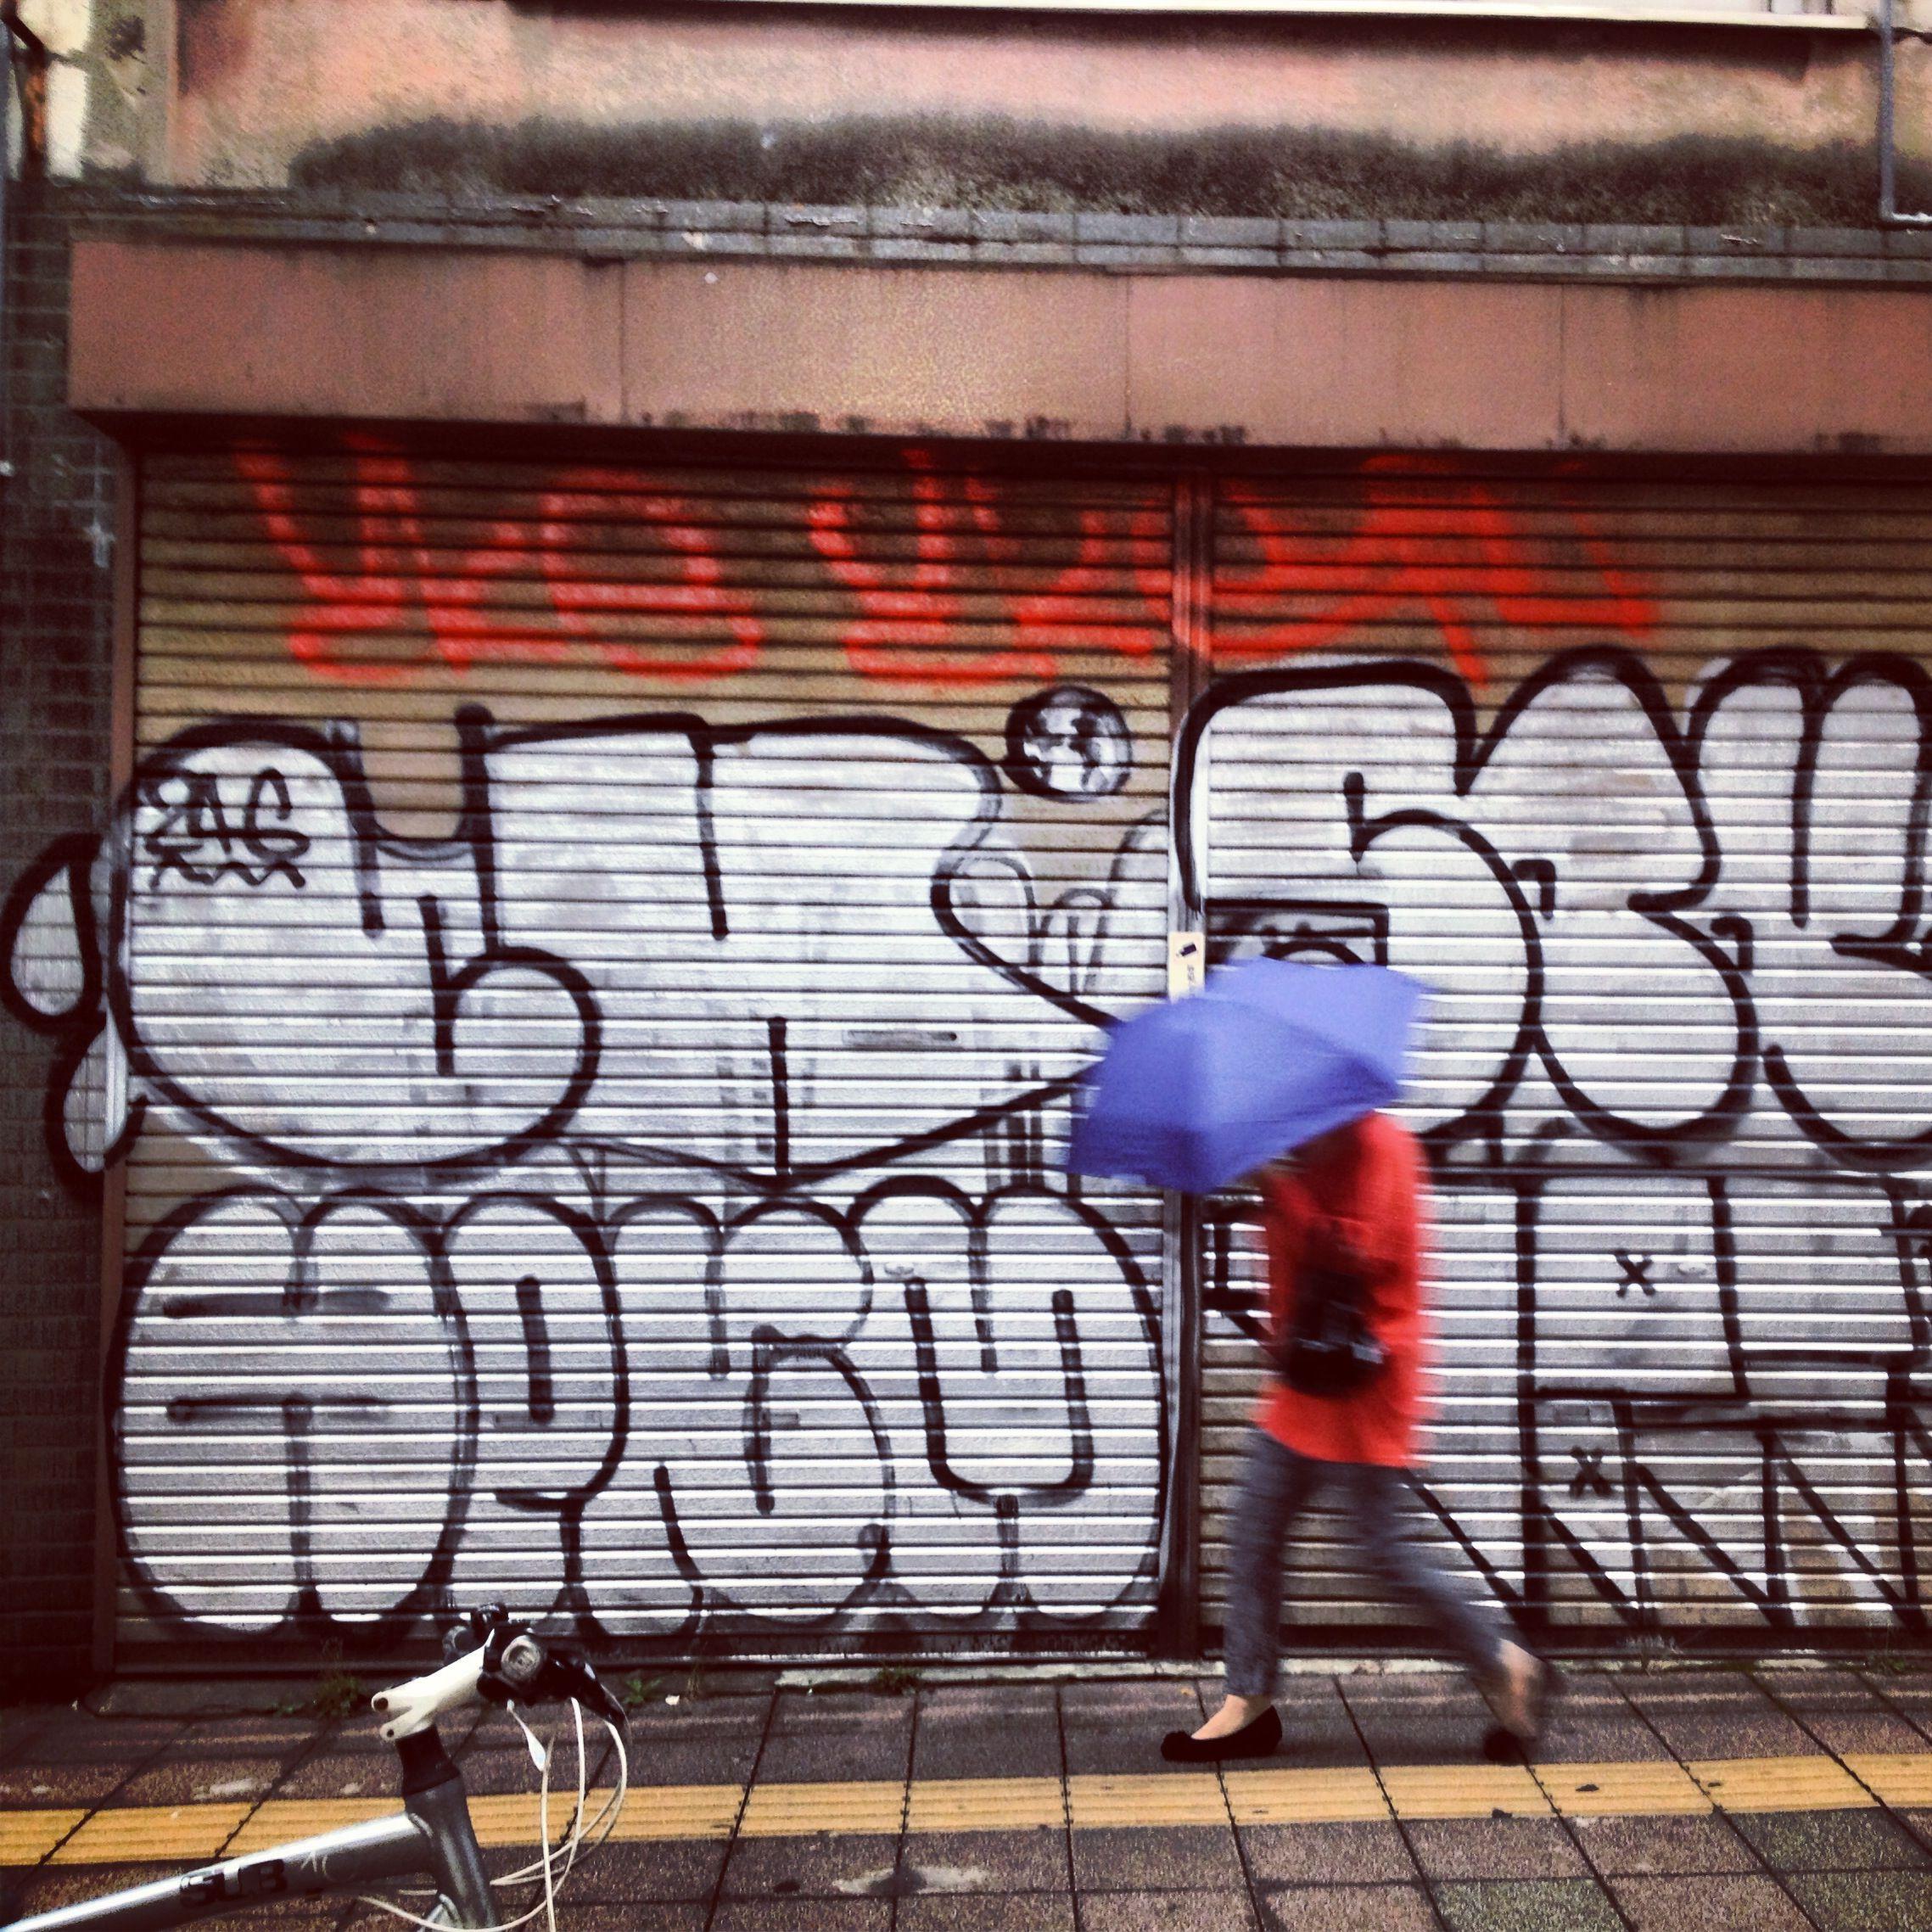 Graffiti wall tokyo - Photo By Harry Maison Graffiti Everywhere Along Route 246 In Sagenjaya Ward Tokyo